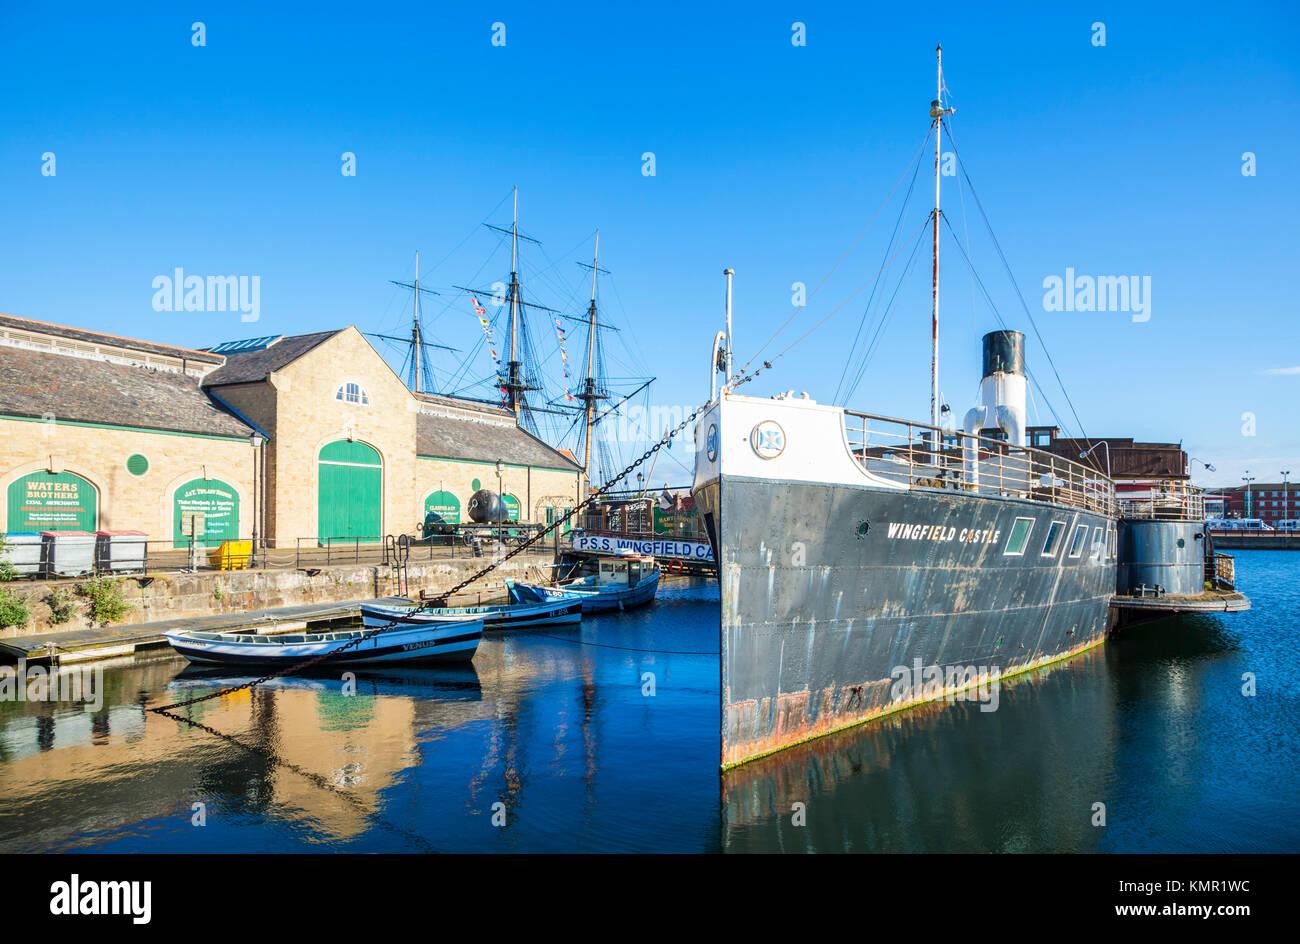 england hartlepool england National Museum of the Royal Navy historic dockyard Hartlepool marina hartlepool county - Stock Image